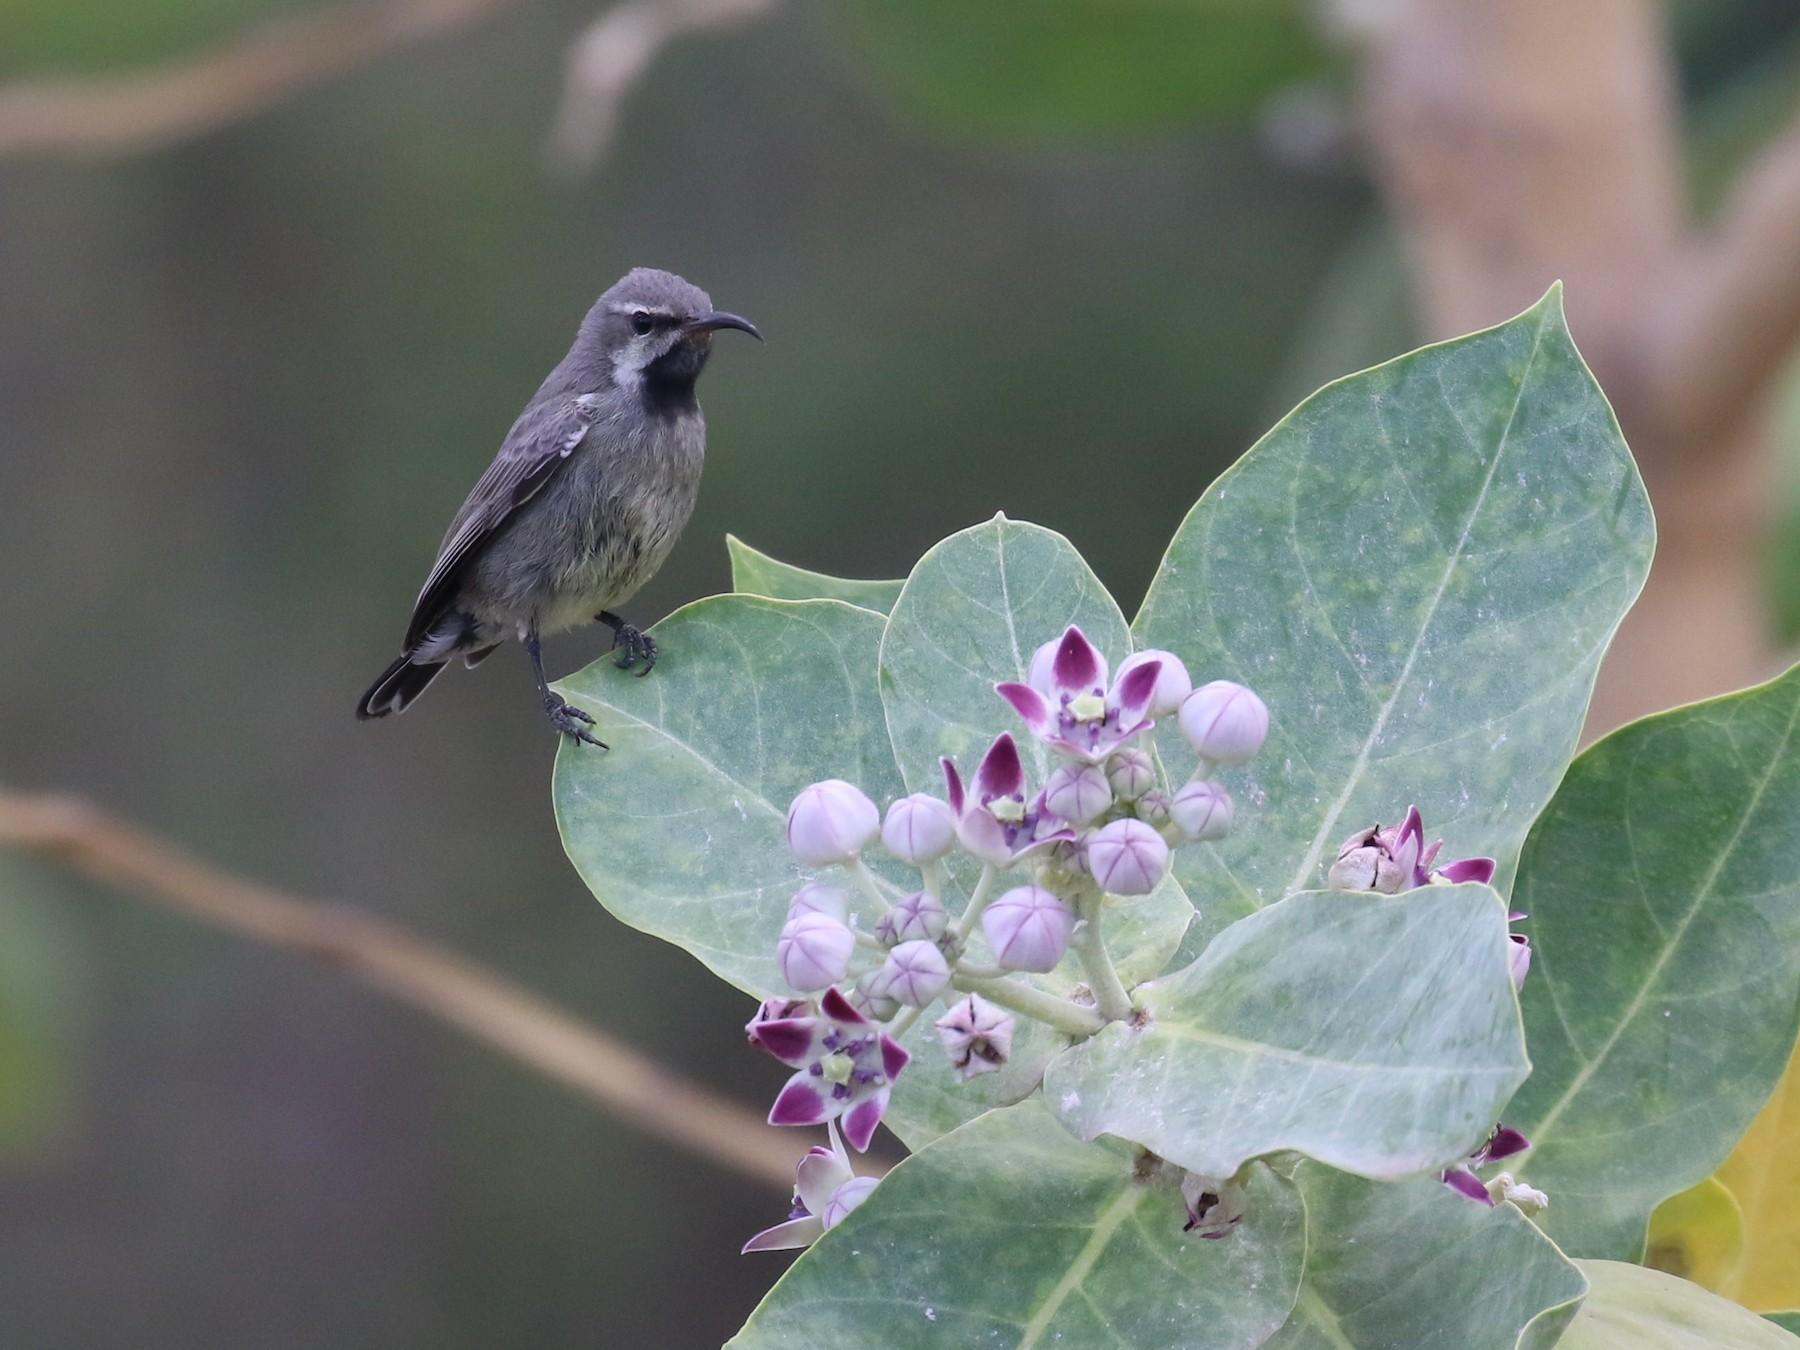 Copper Sunbird - Fikret Ataşalan